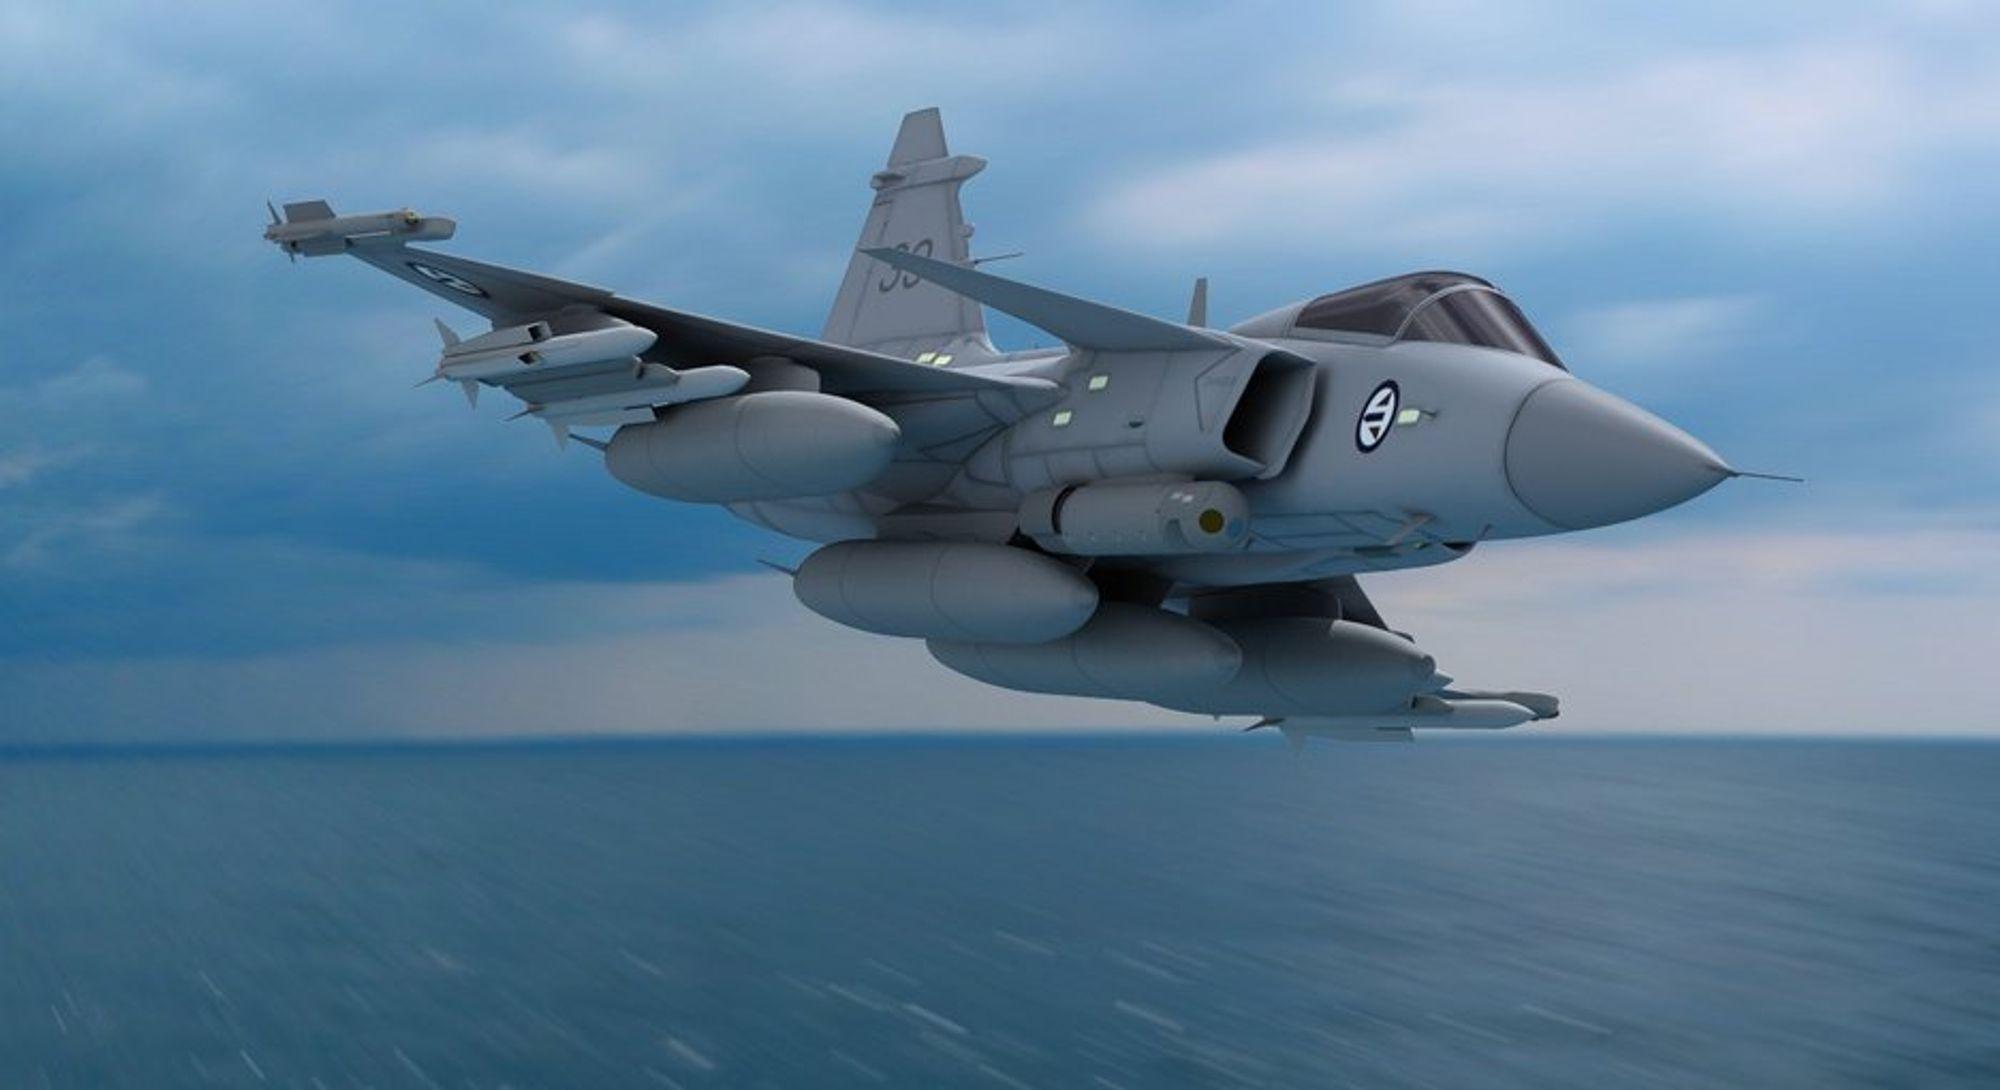 JAS Gripen koster Danmark halvparten av JSF med Saabs nye prisgaranti.